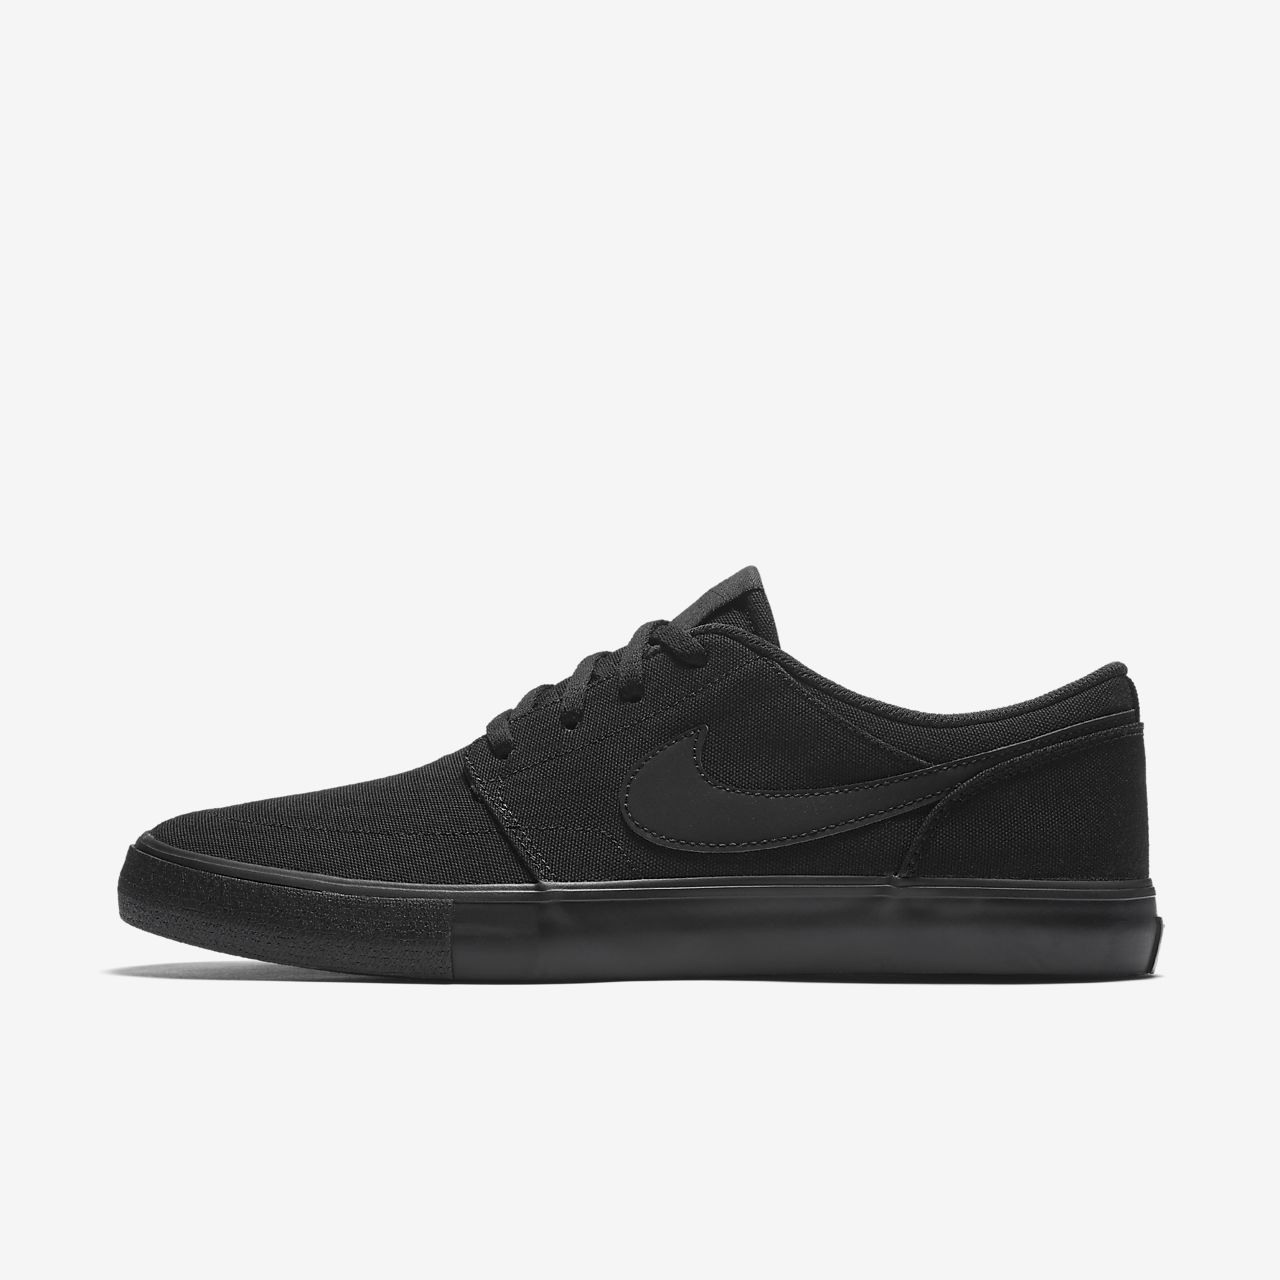 Nike SB Solarsoft Portmore 2 Sabatilles de skateboard